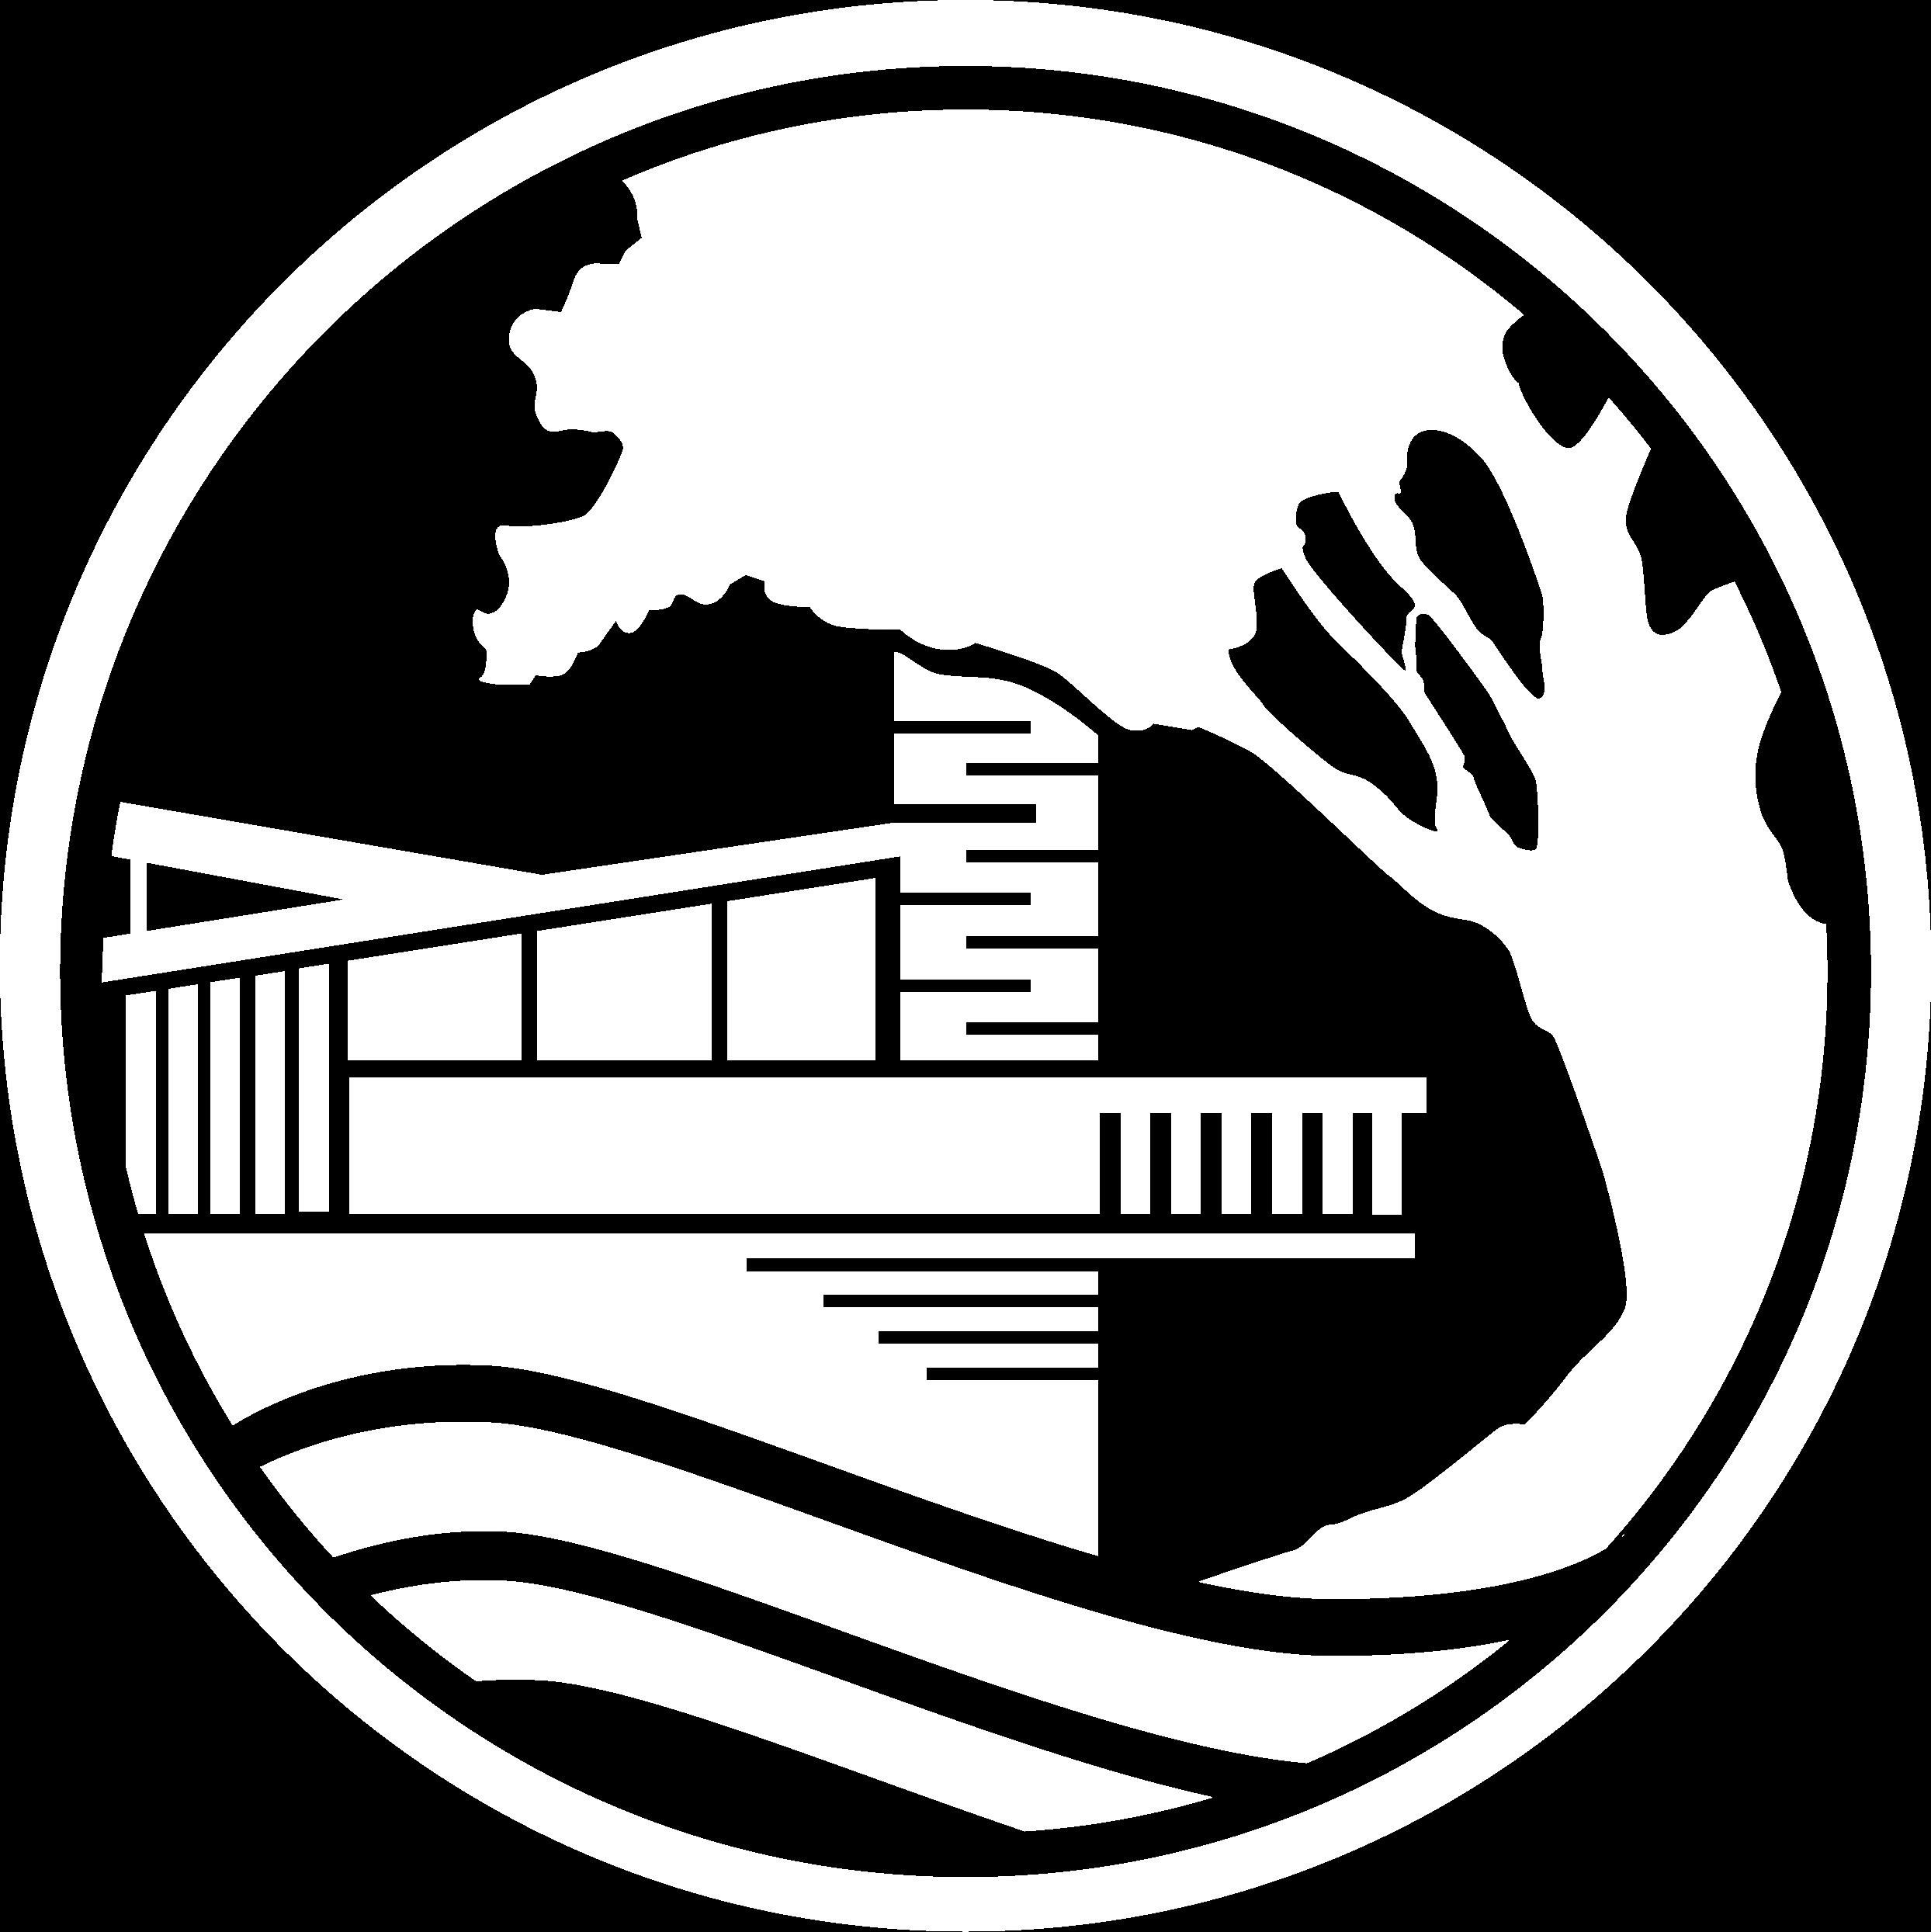 STADT. LAND. BAD. GmbH